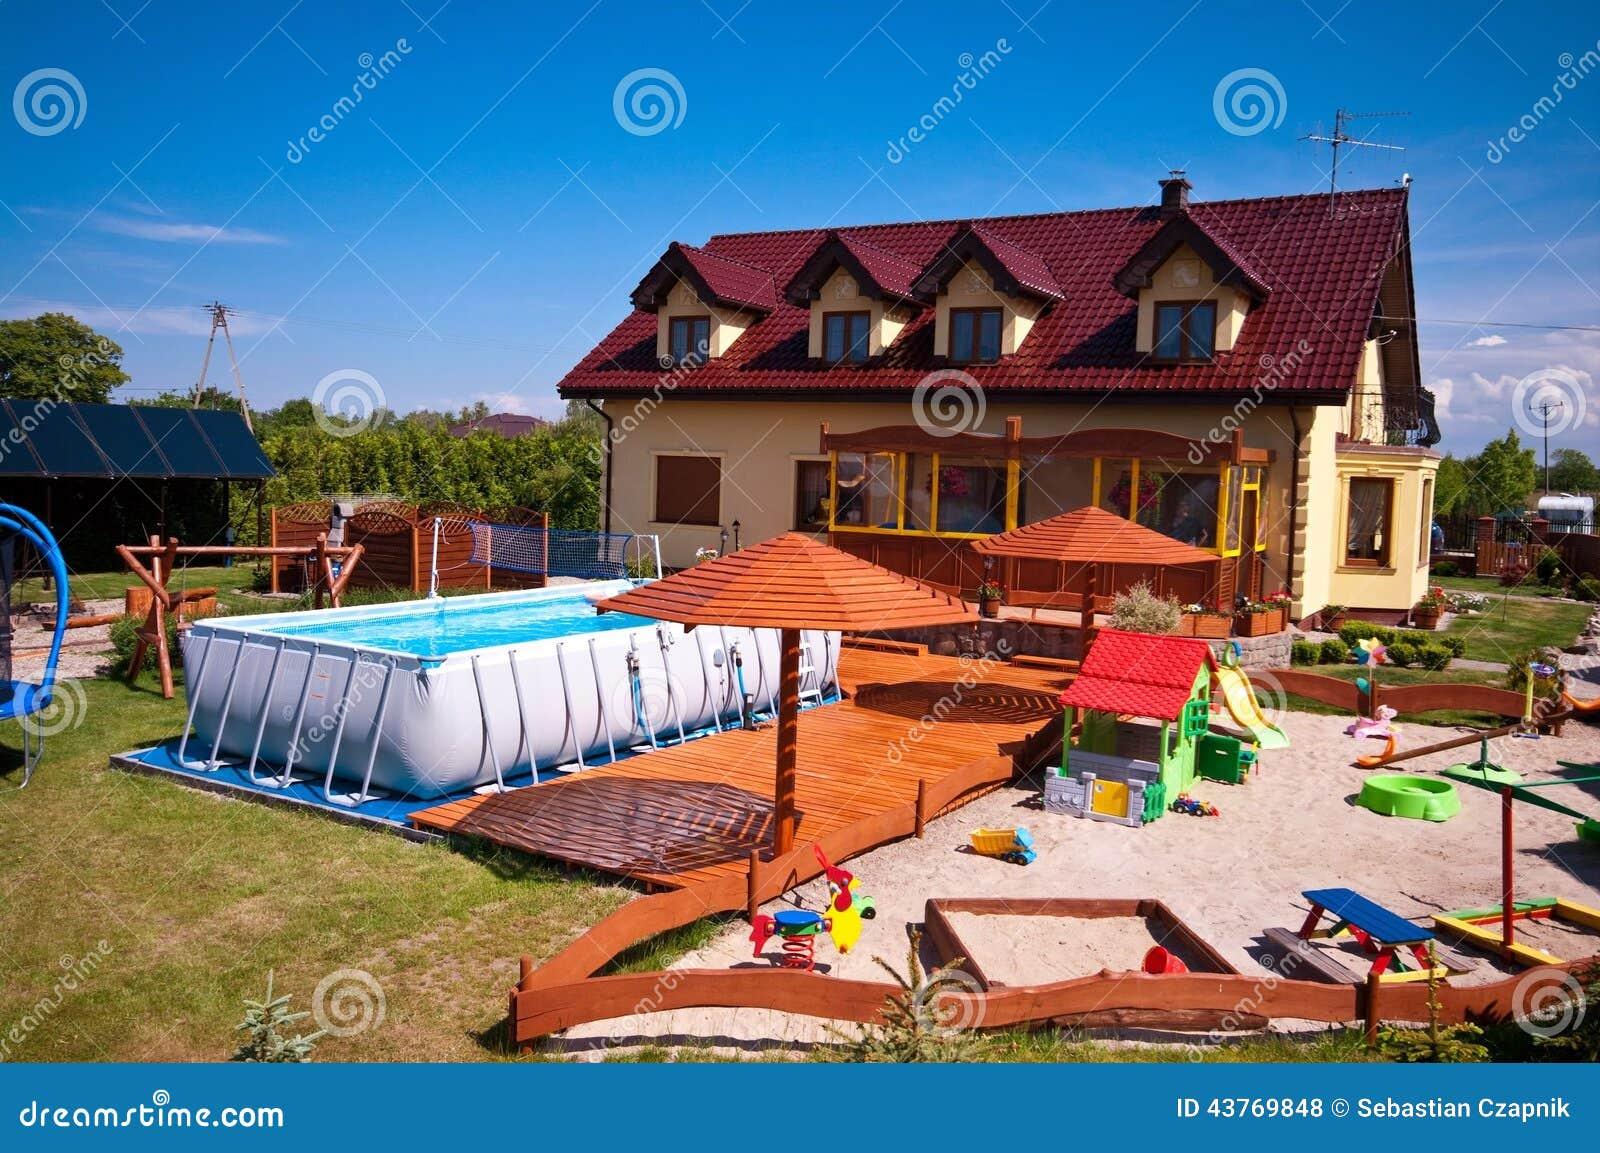 Backyard With Swimming Pool And Sandbox Stock Photo